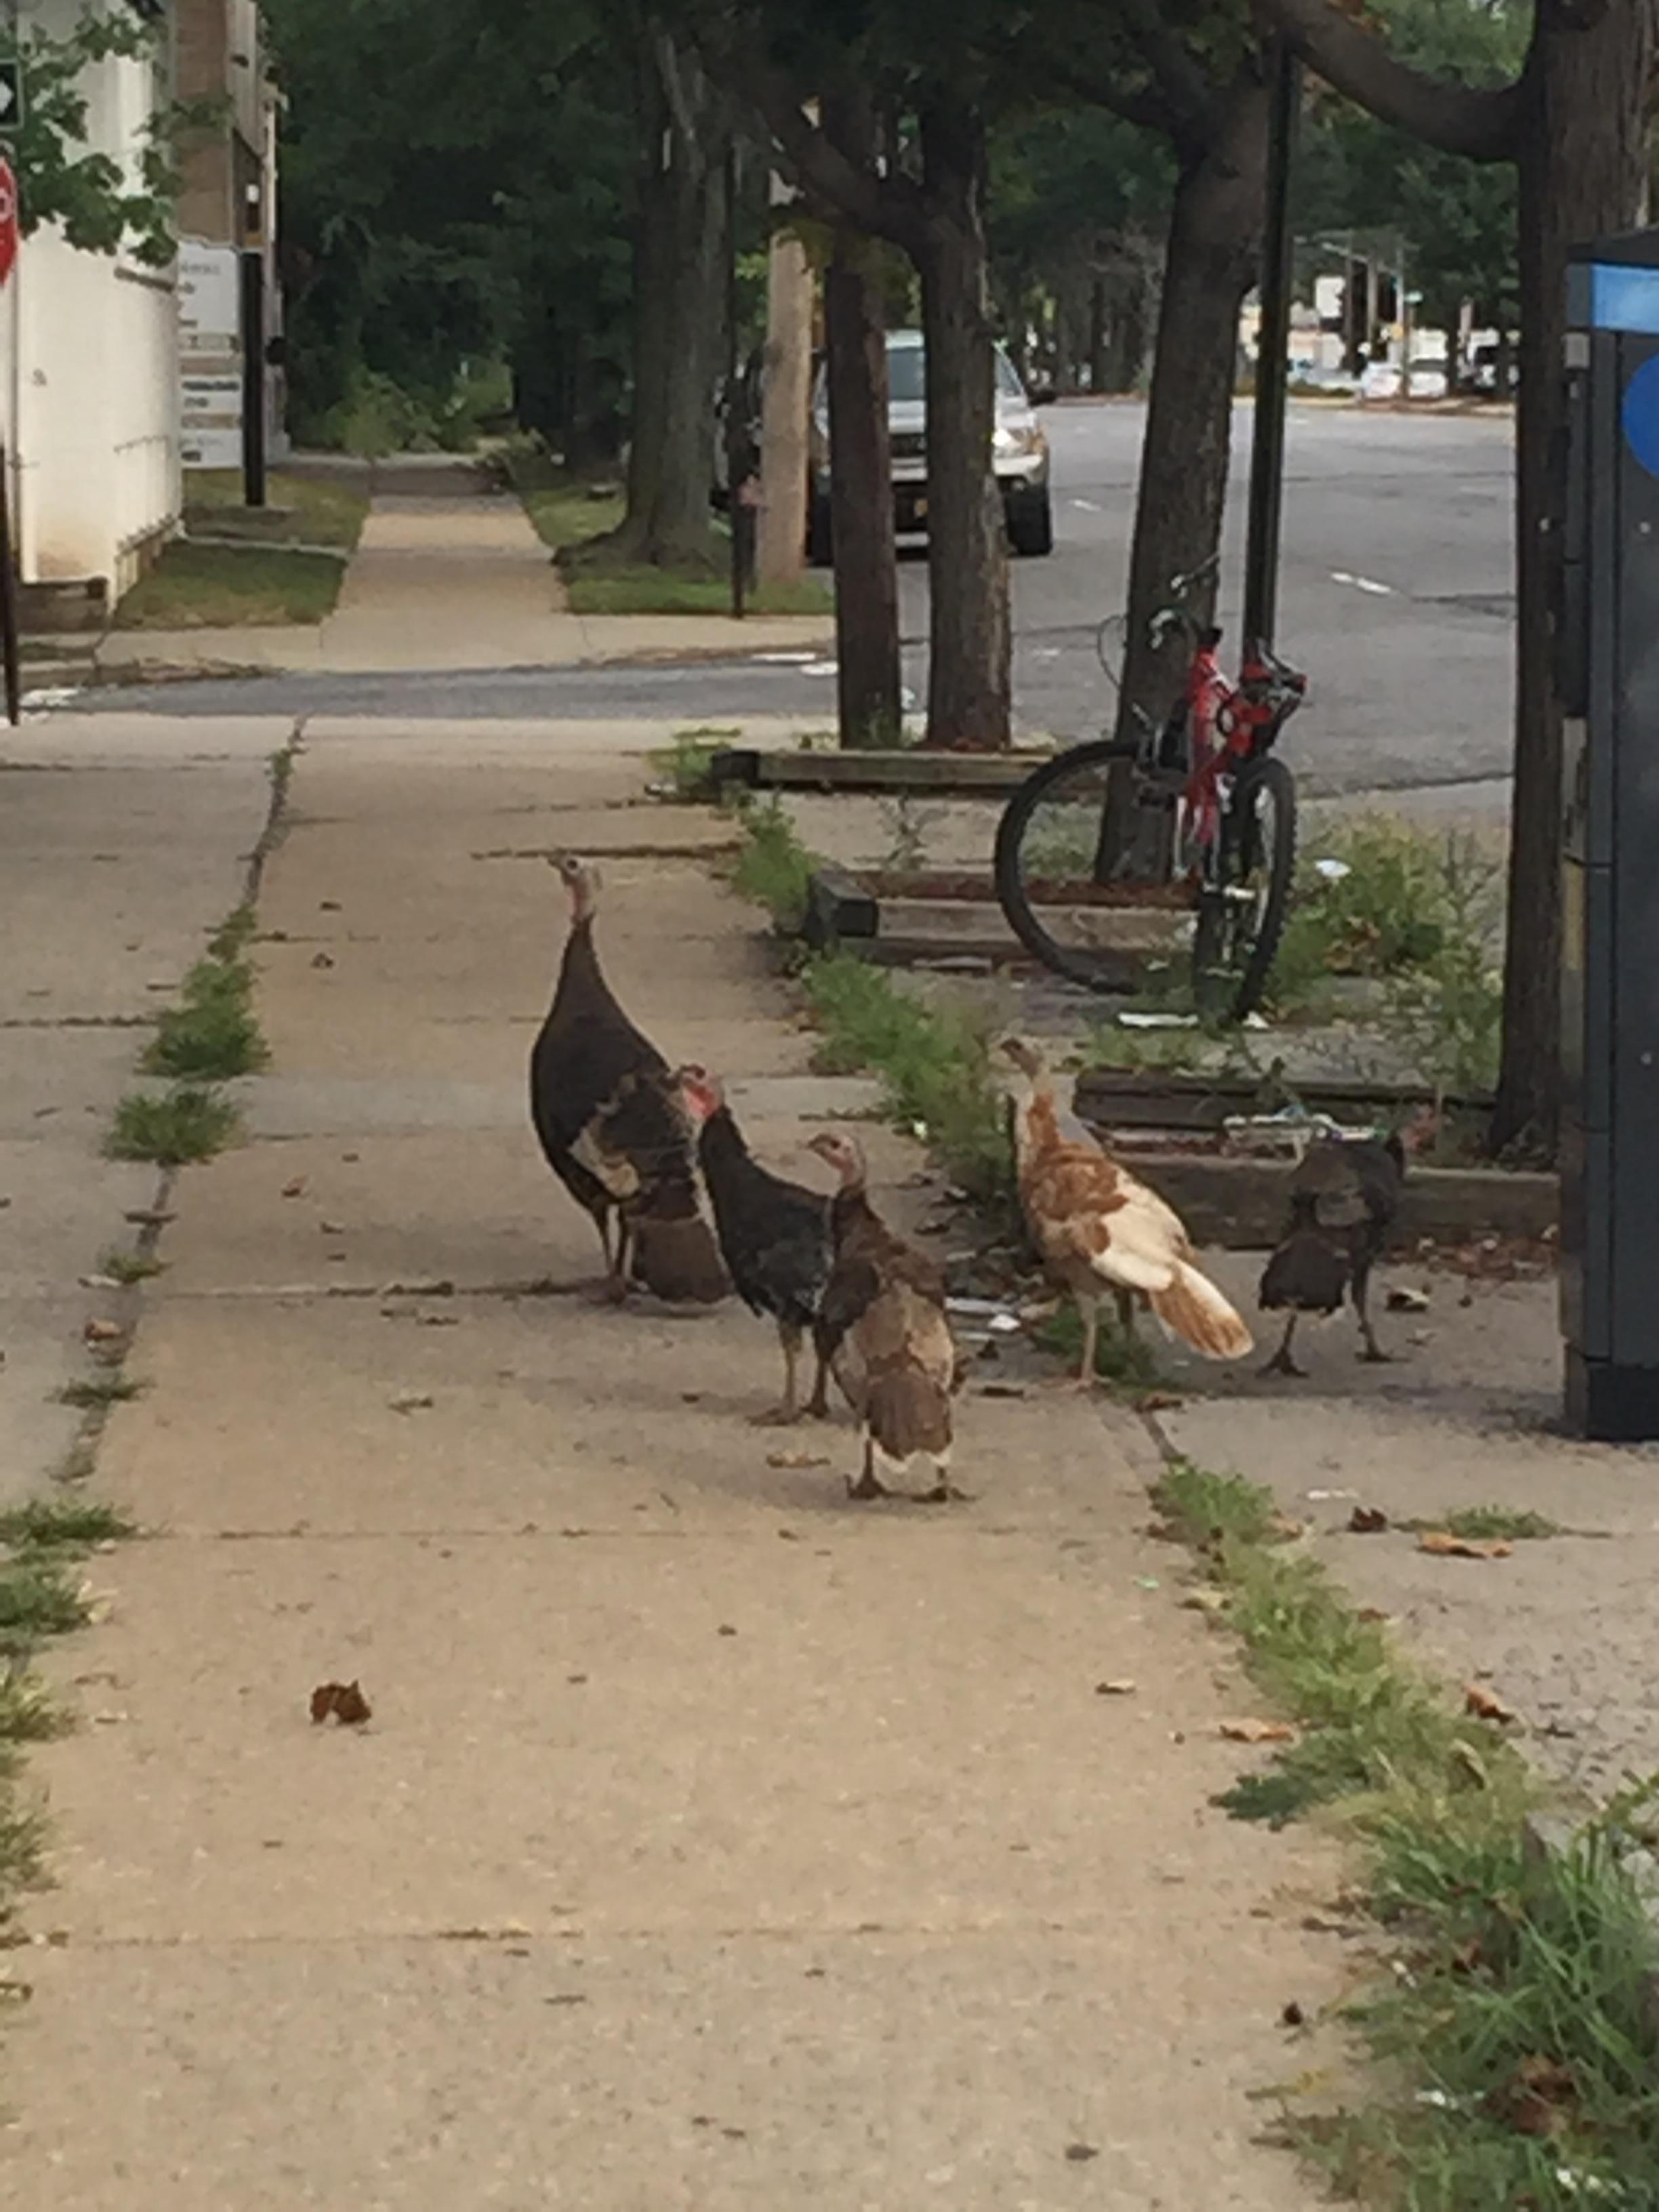 Gaggle of Wild Turkeys on Seaview Ave